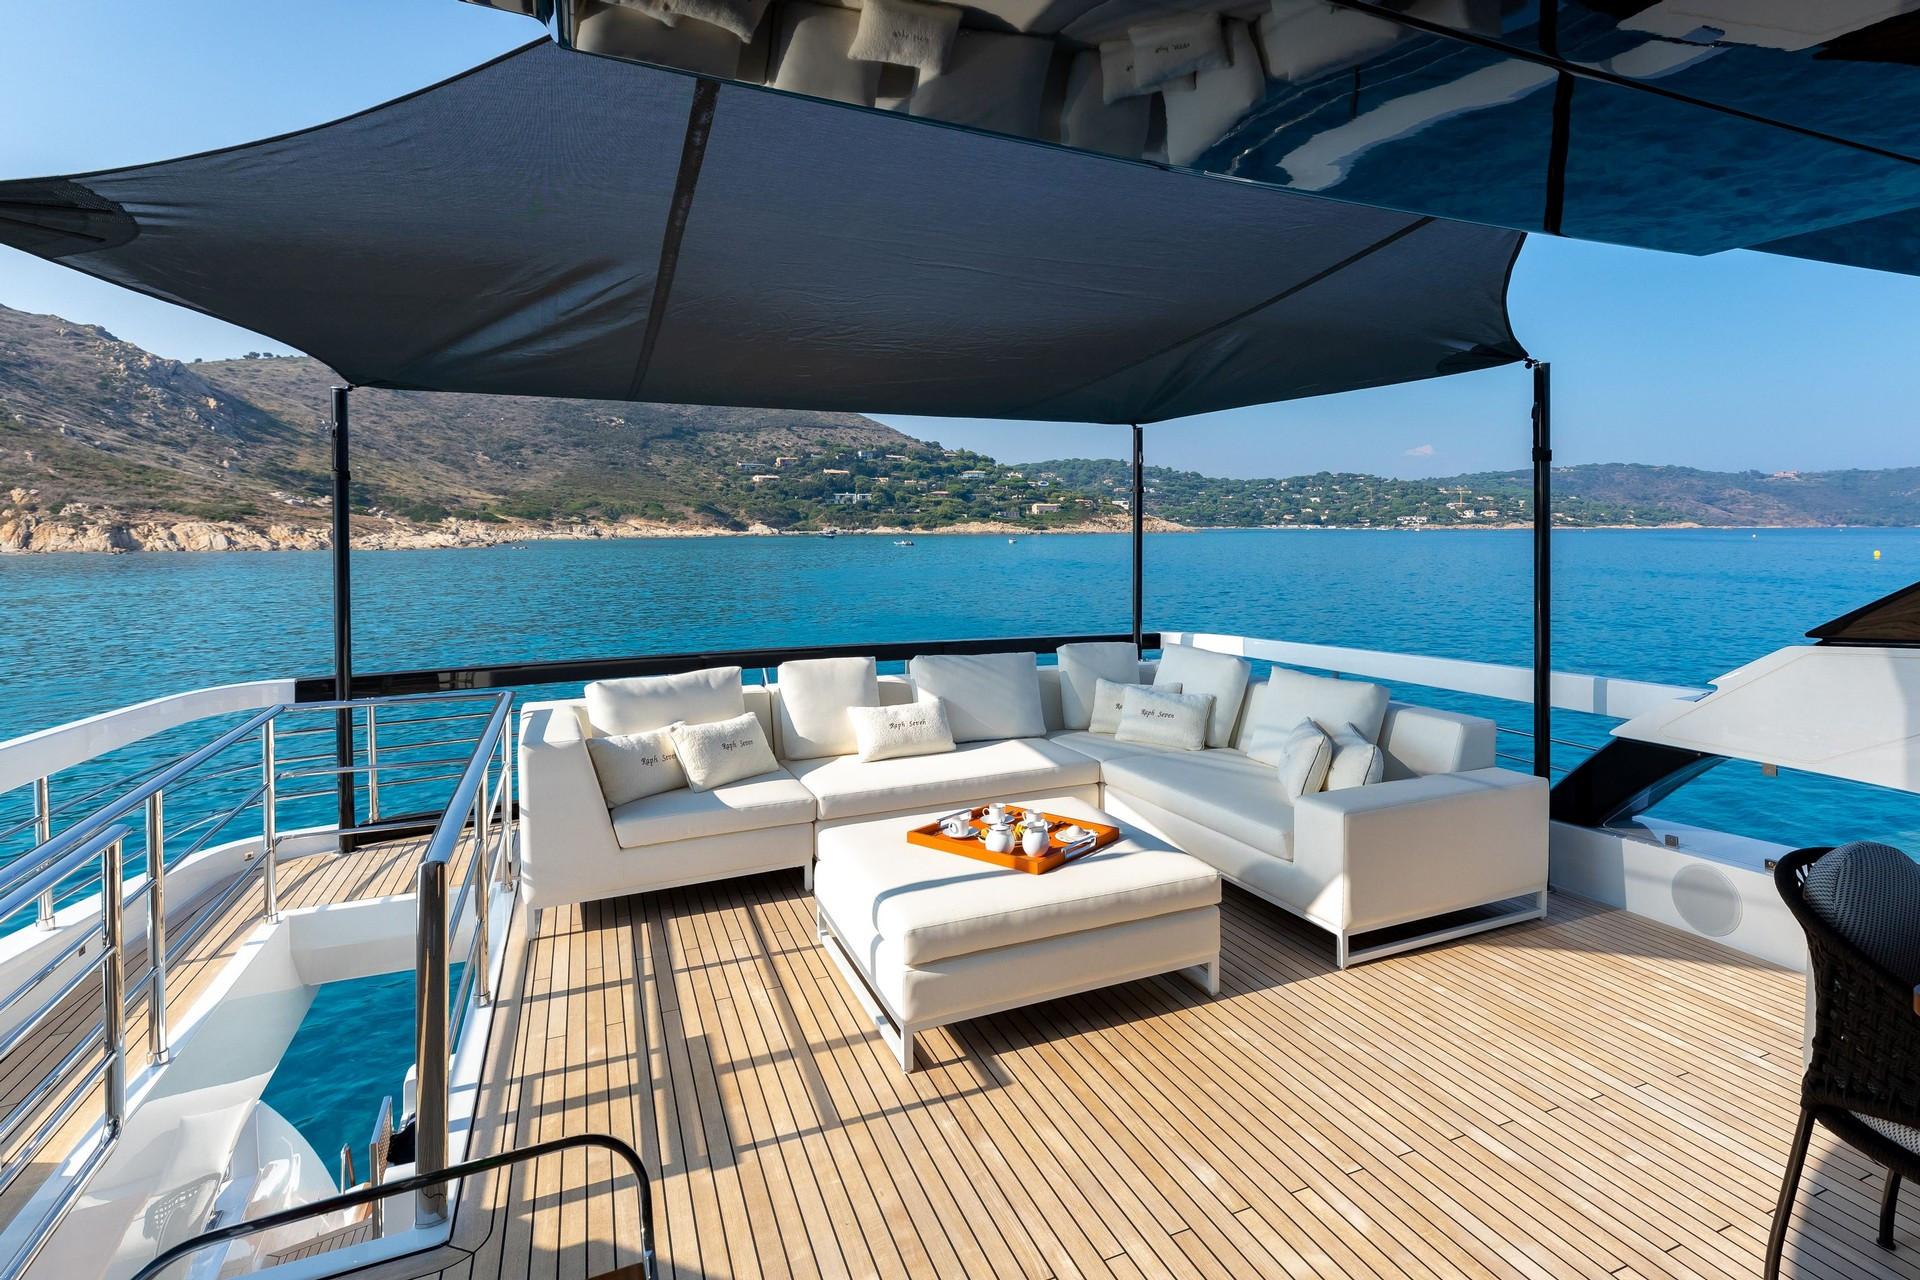 Riva 100 Corsaro Yacht for Charter (2018)